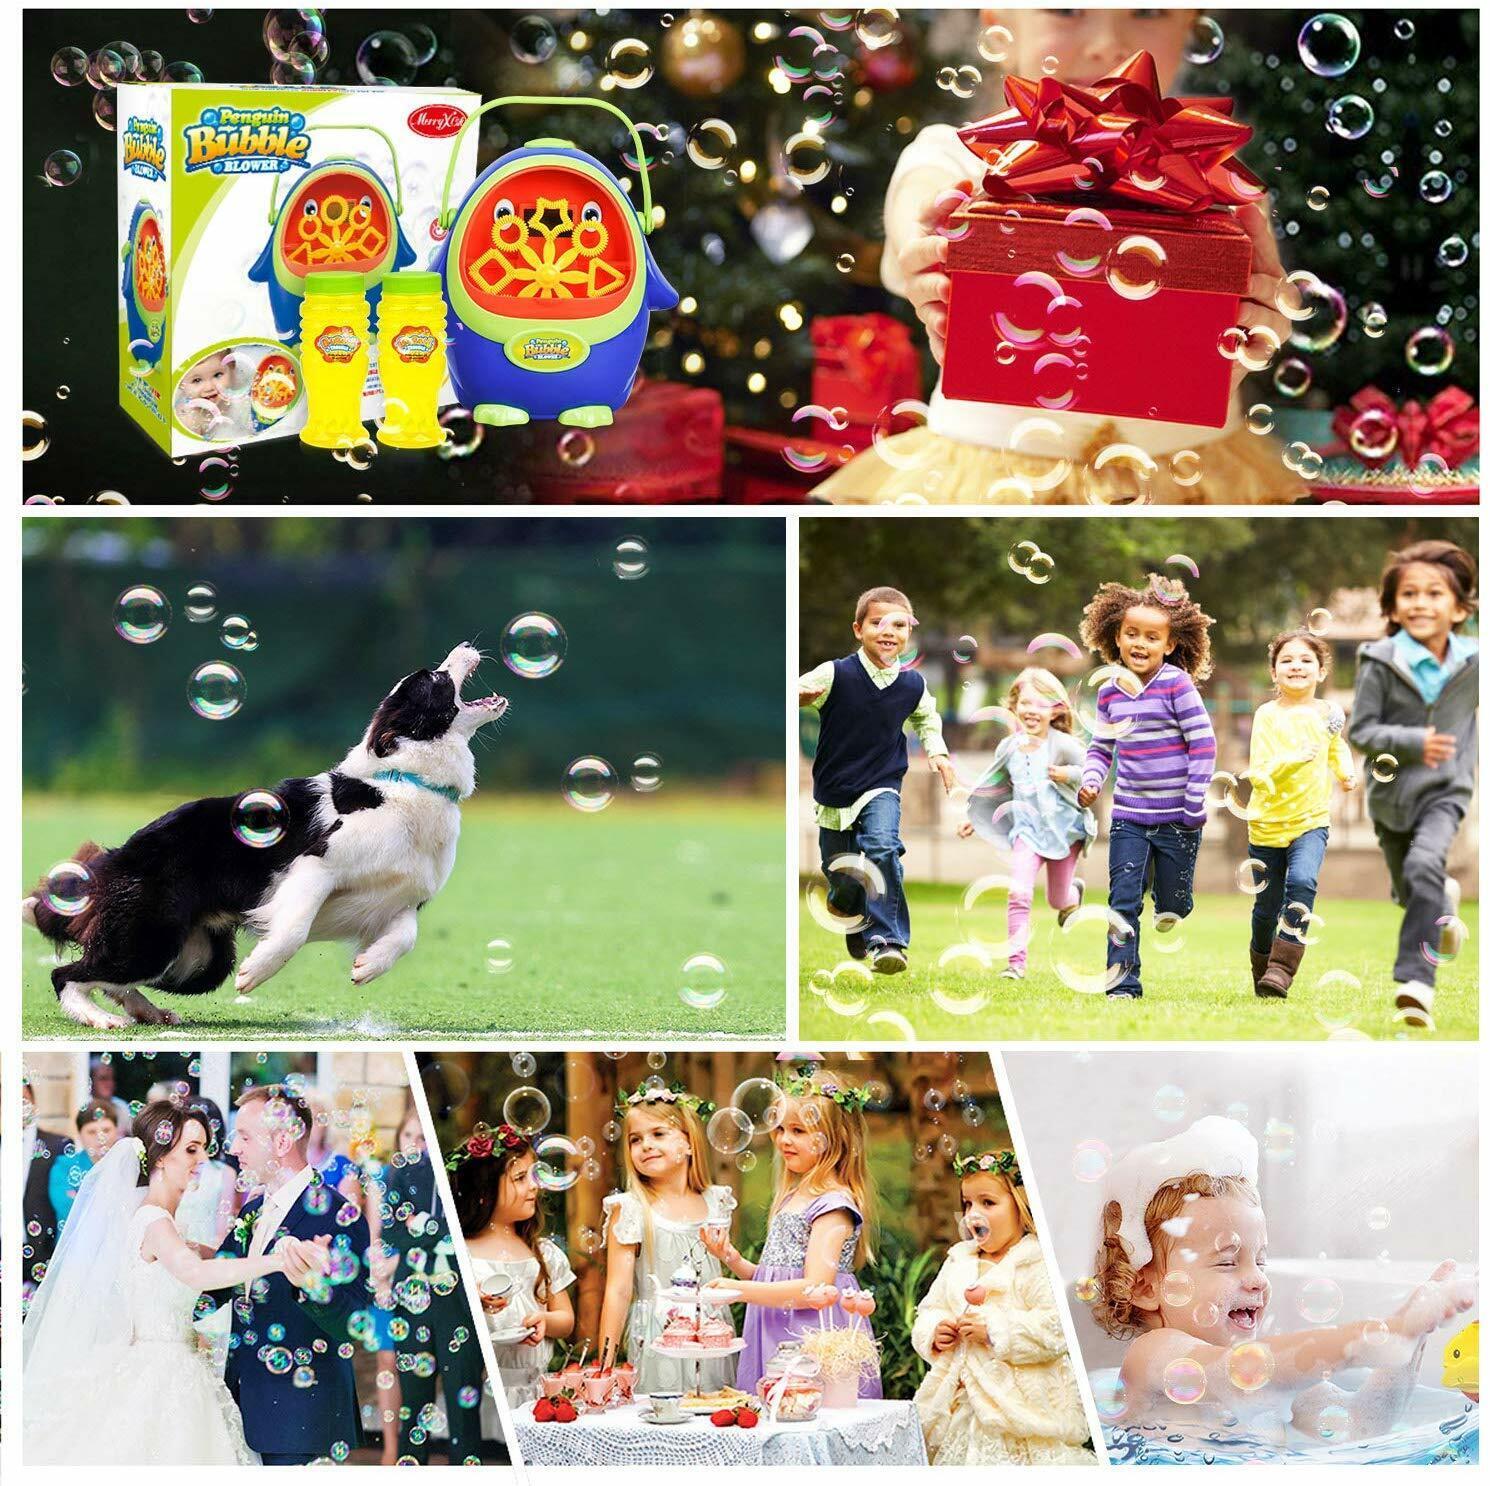 Automatic Bubble Machine with Bubble Solution for Kids Toddlers, Penguin Bubble Bubble Toys